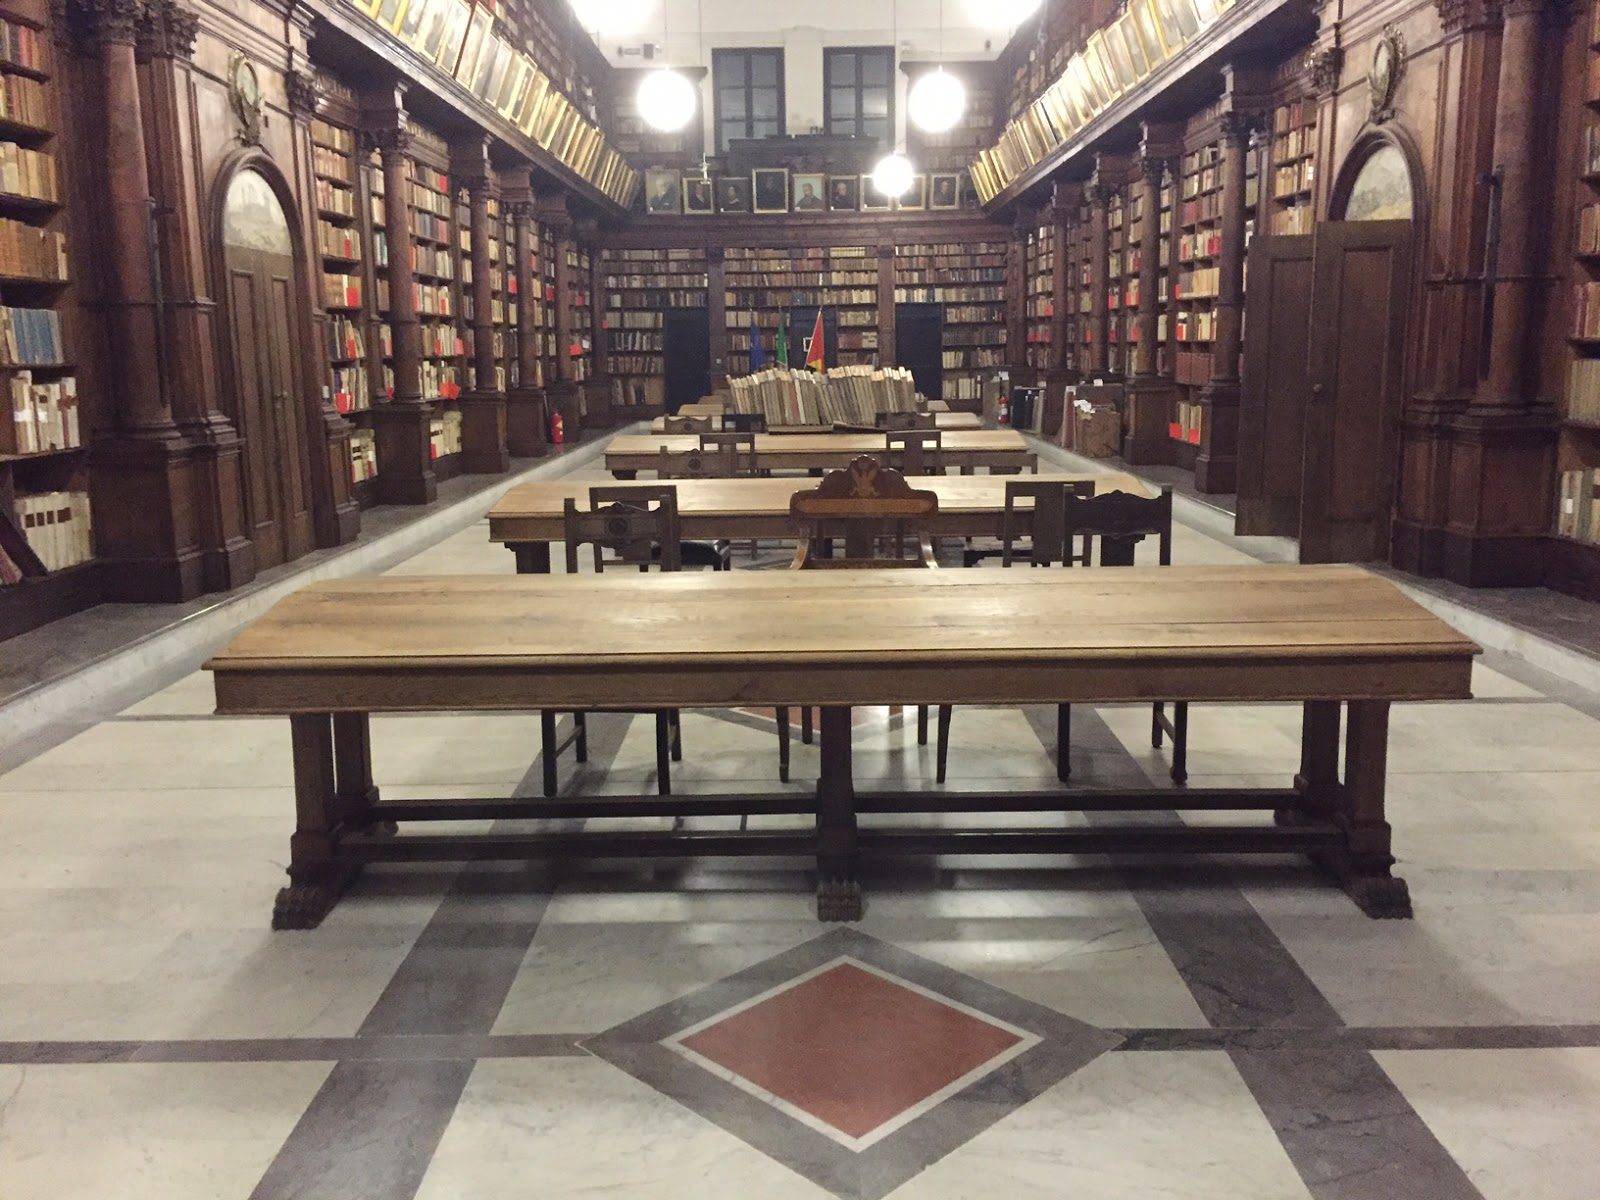 Biblioteca Comunale, Palermo